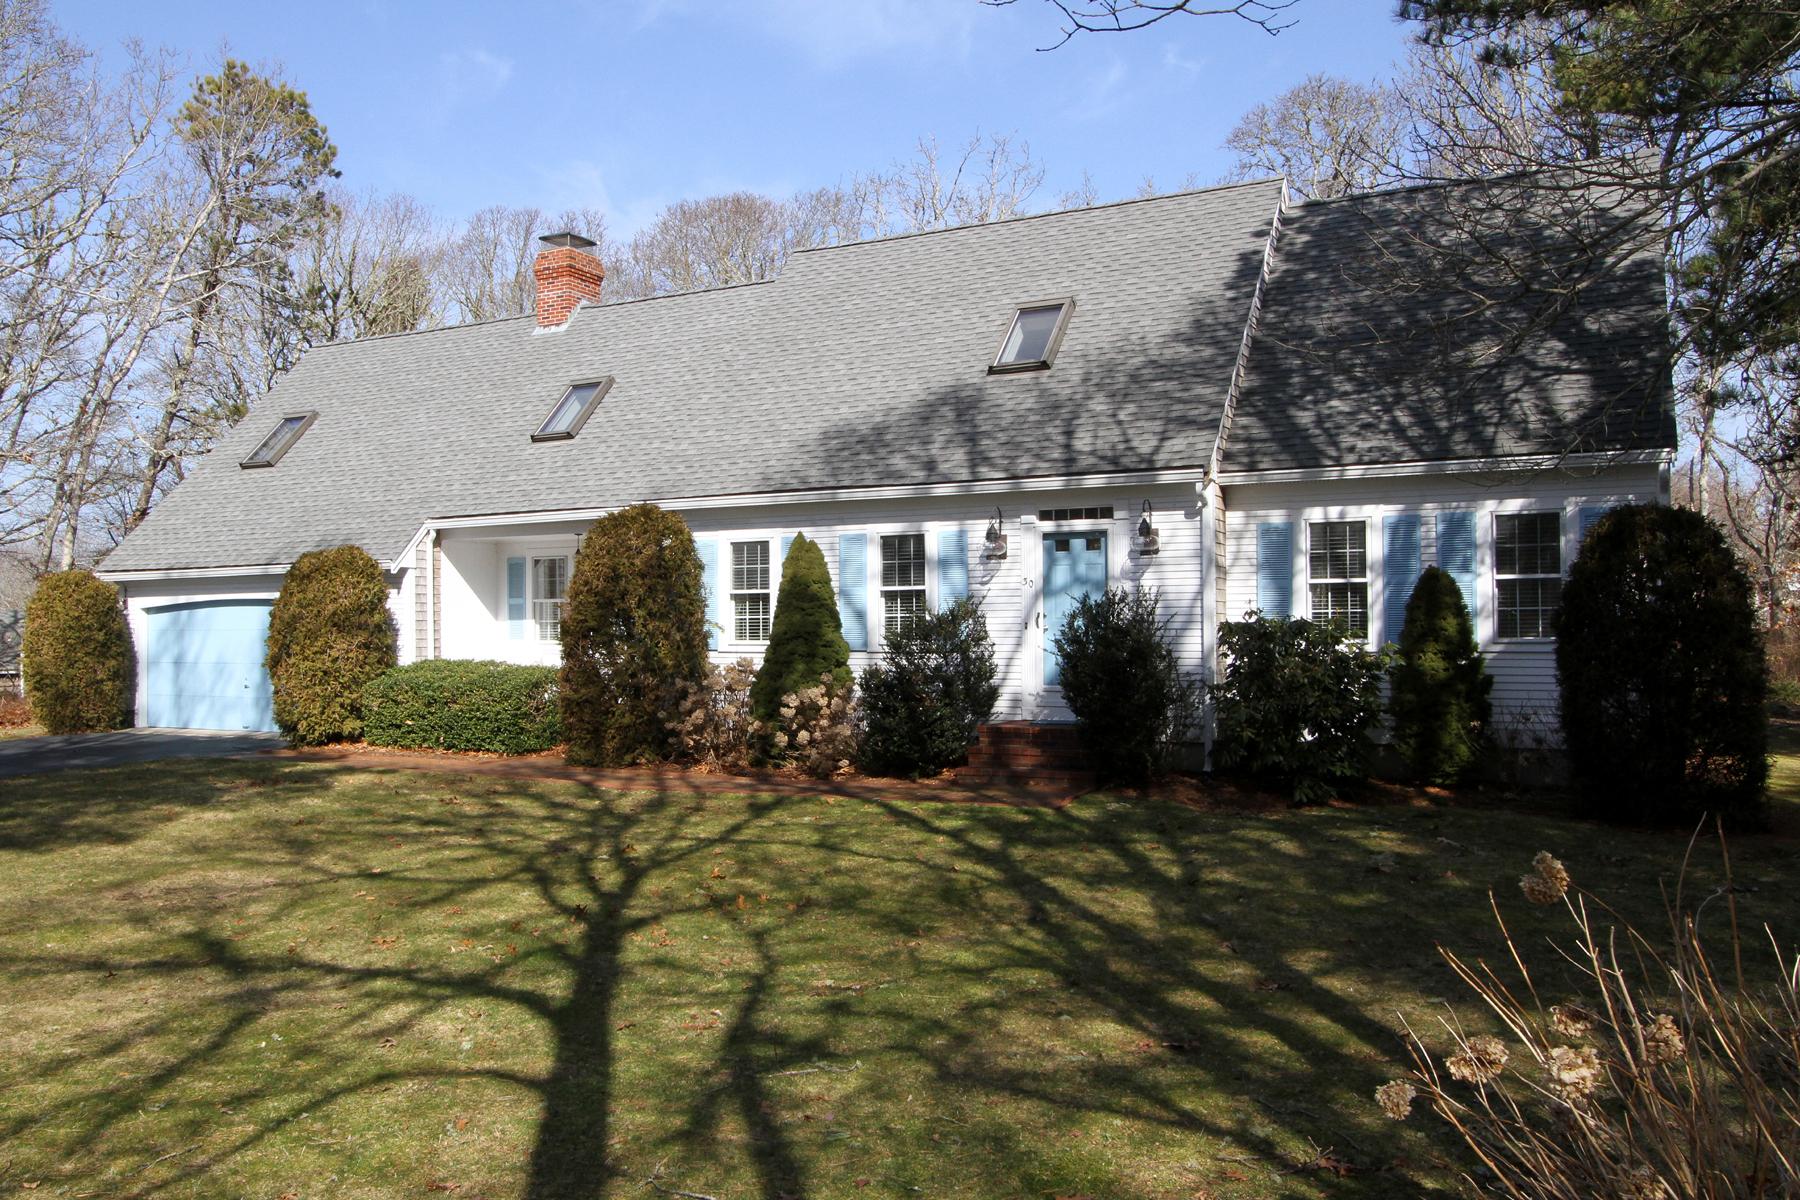 sales property at 30 Schooner Drive, Harwich, MA